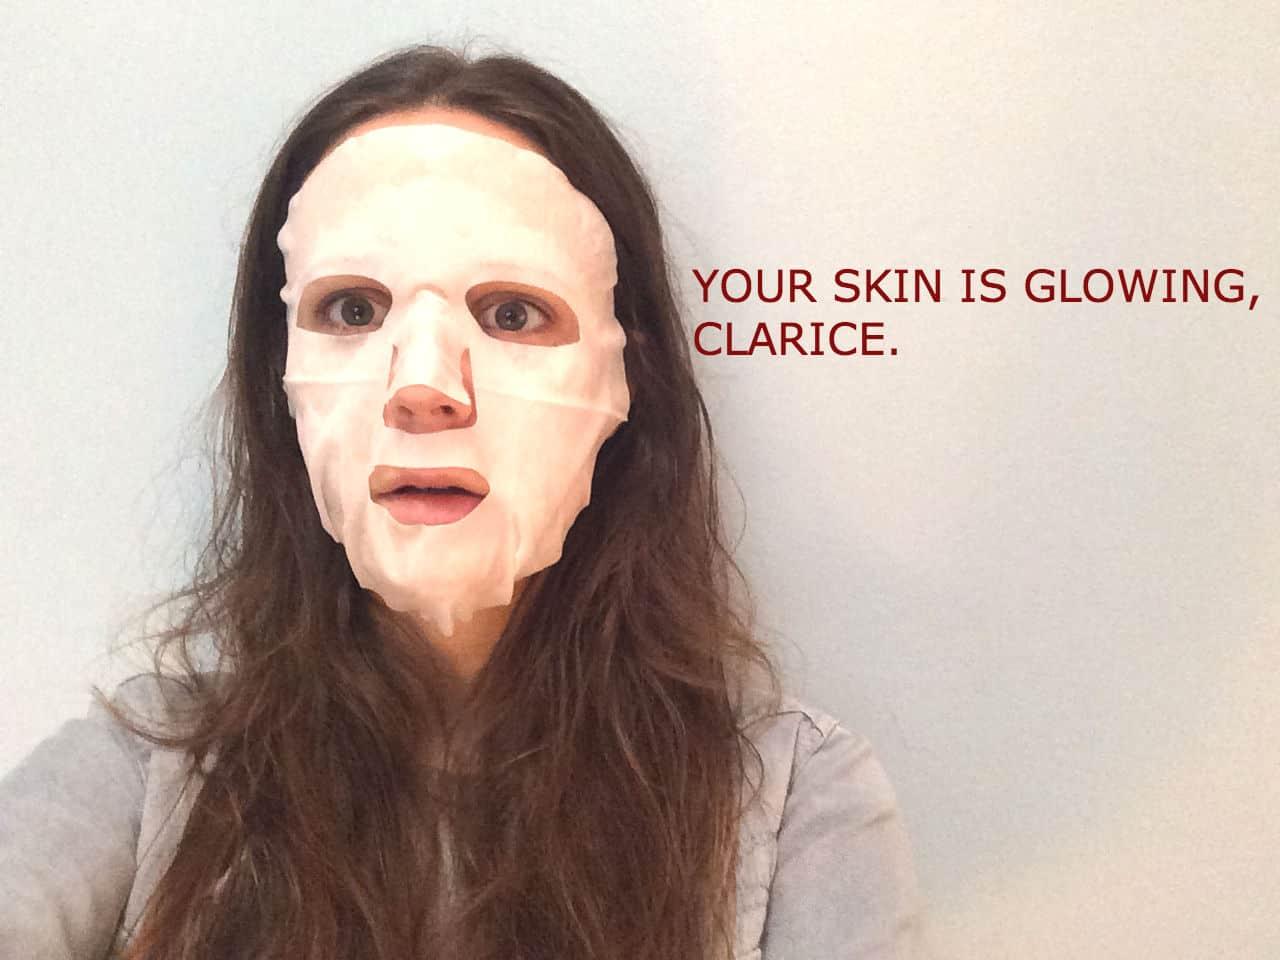 spring clean skin mask image